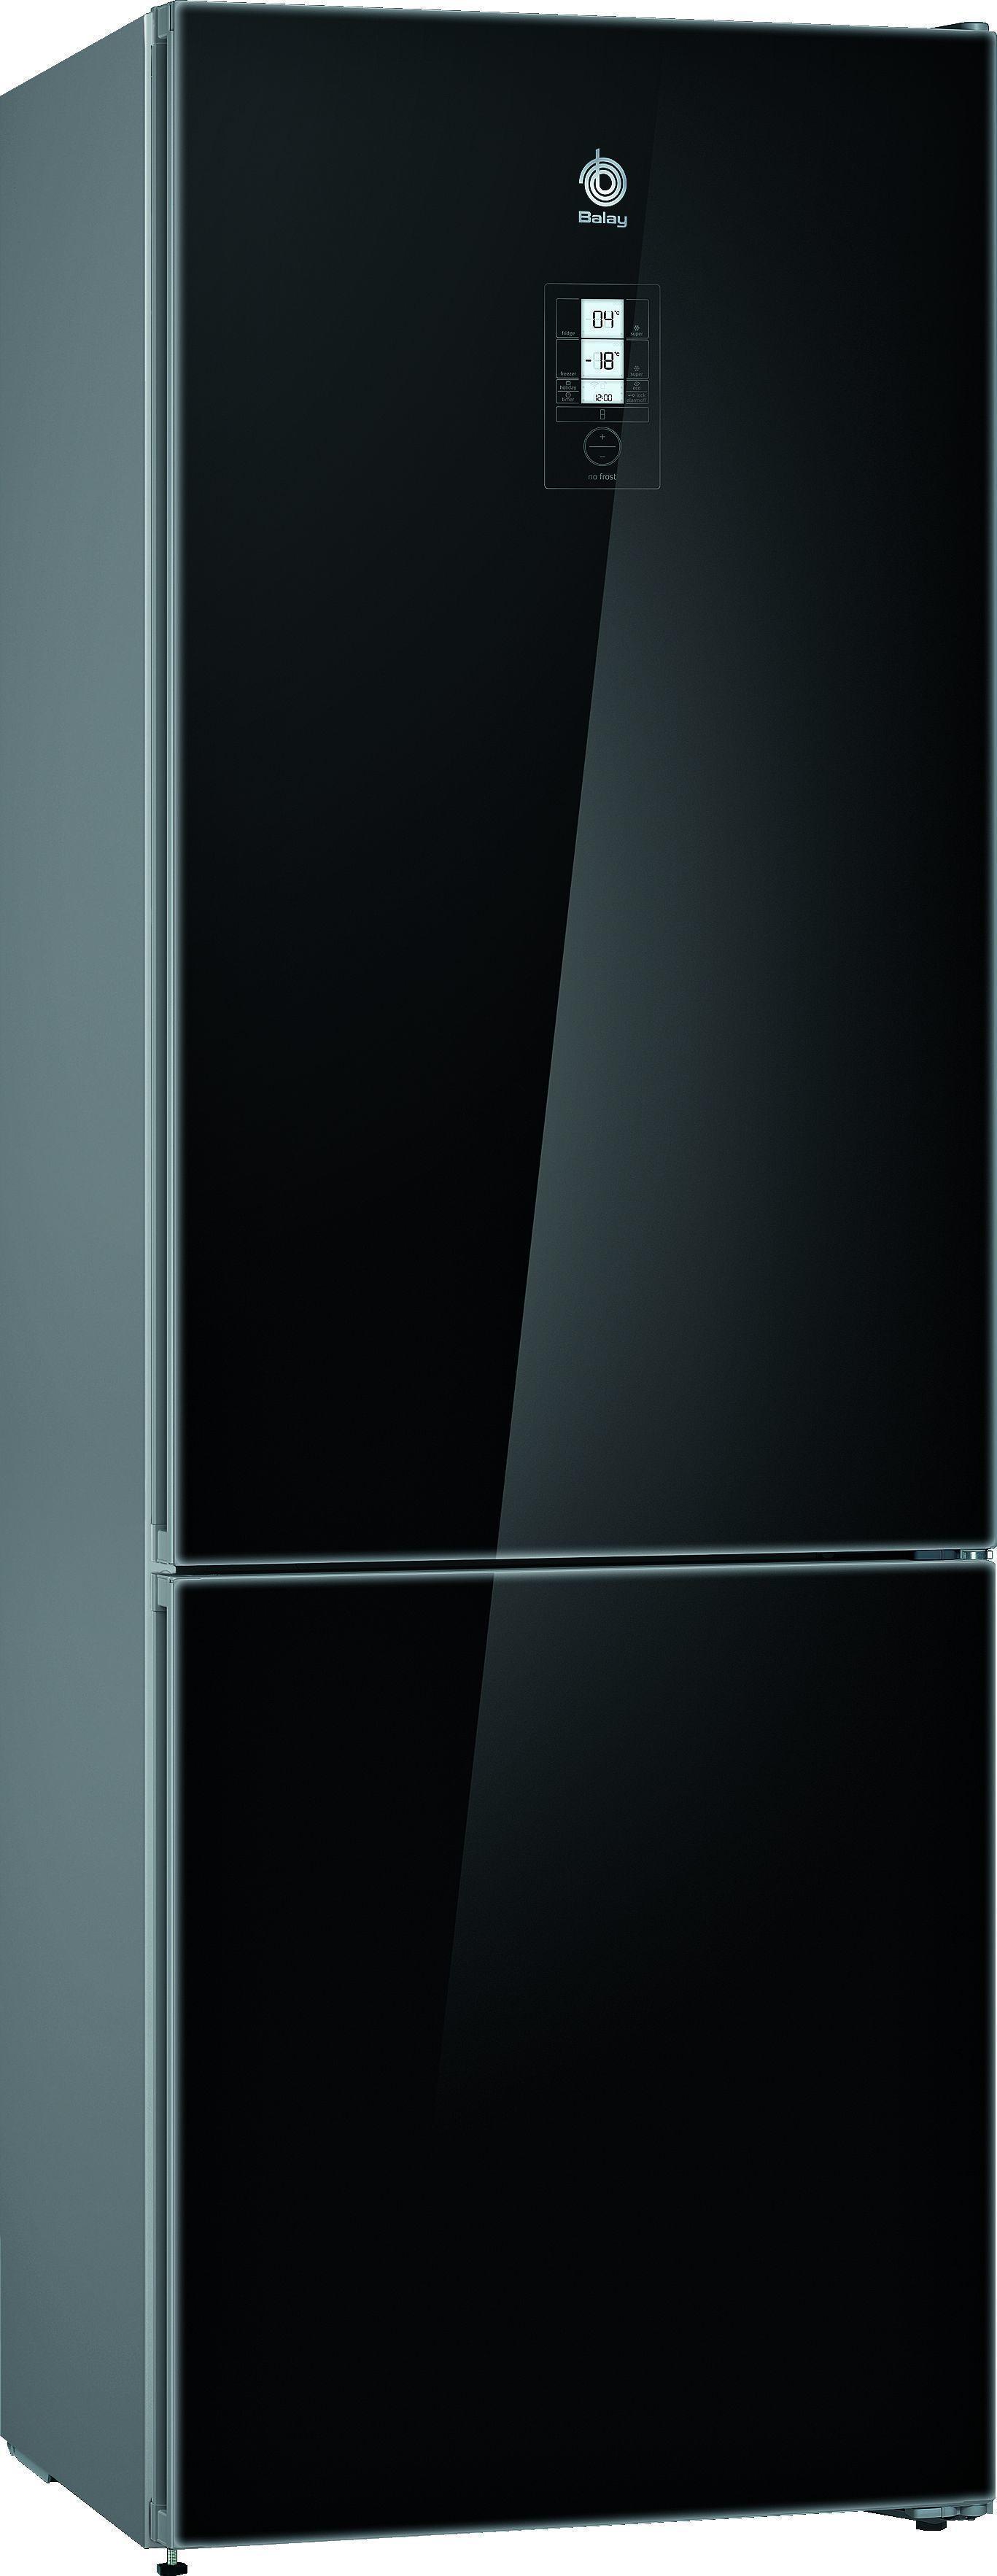 Frigorifico Balay 3KFE778BI Combi 203x70 Negro A++